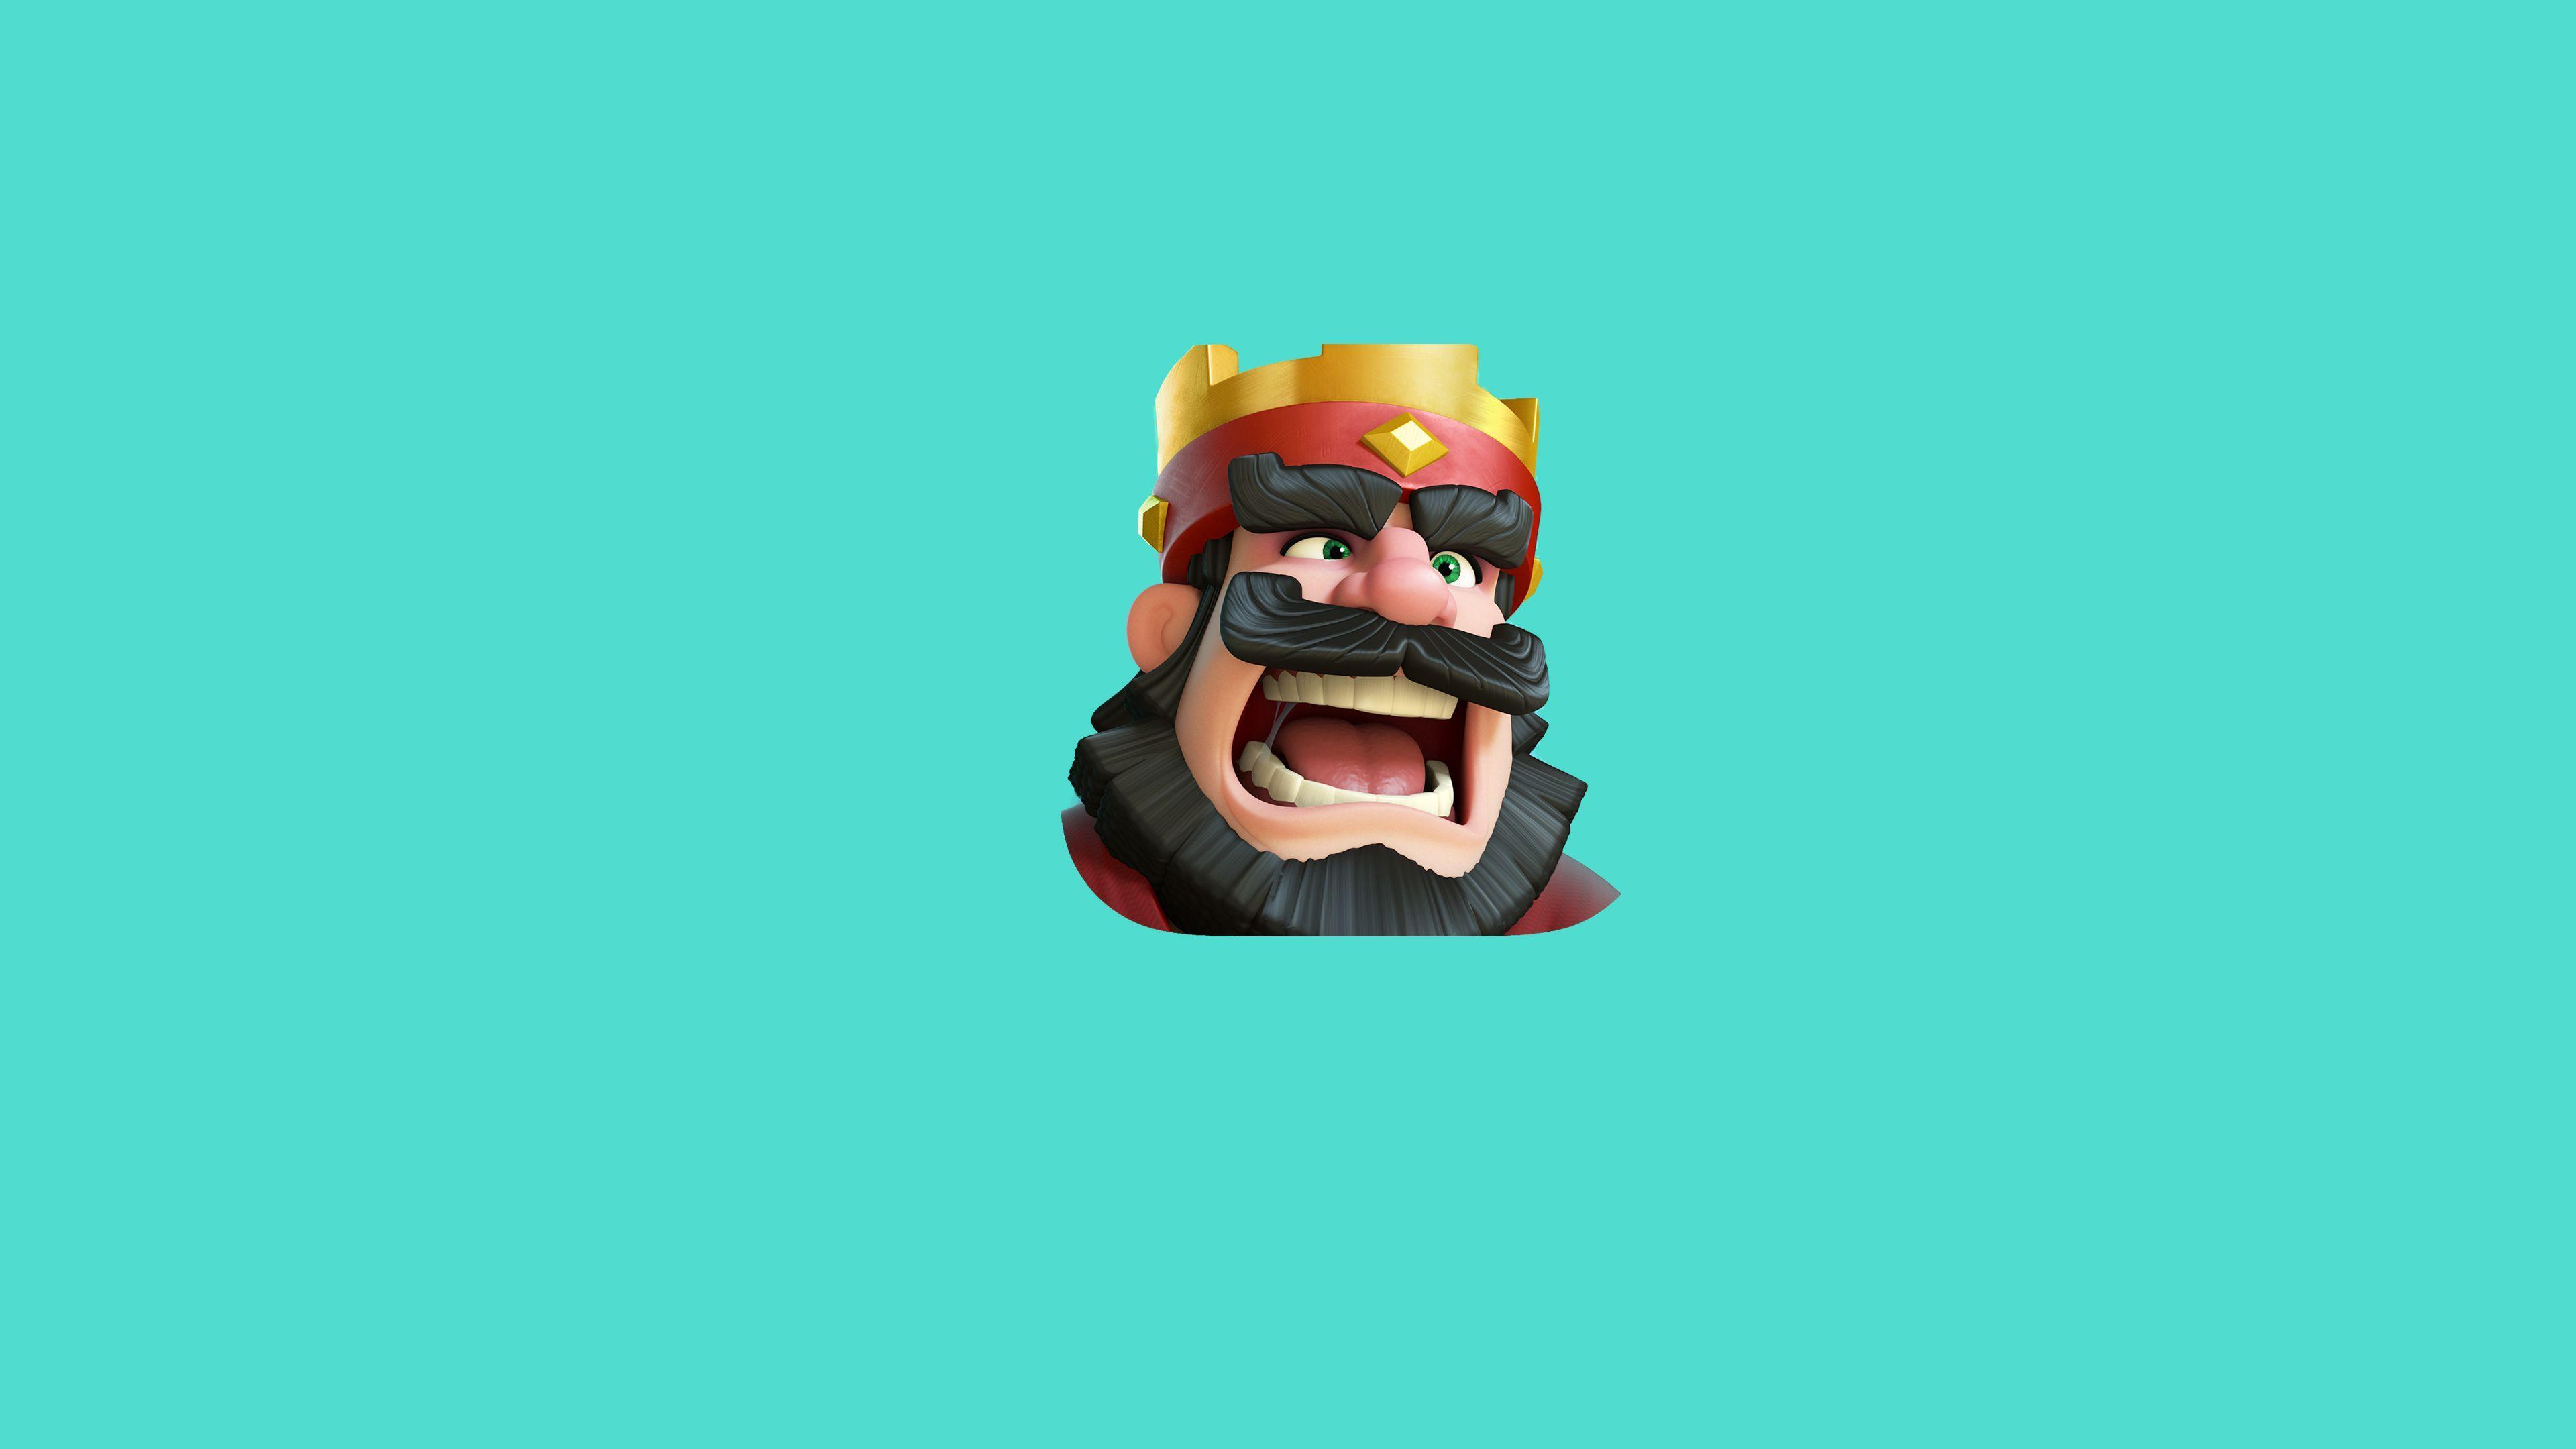 Clash Royale King Wallpaper | Games HD Wallpapers